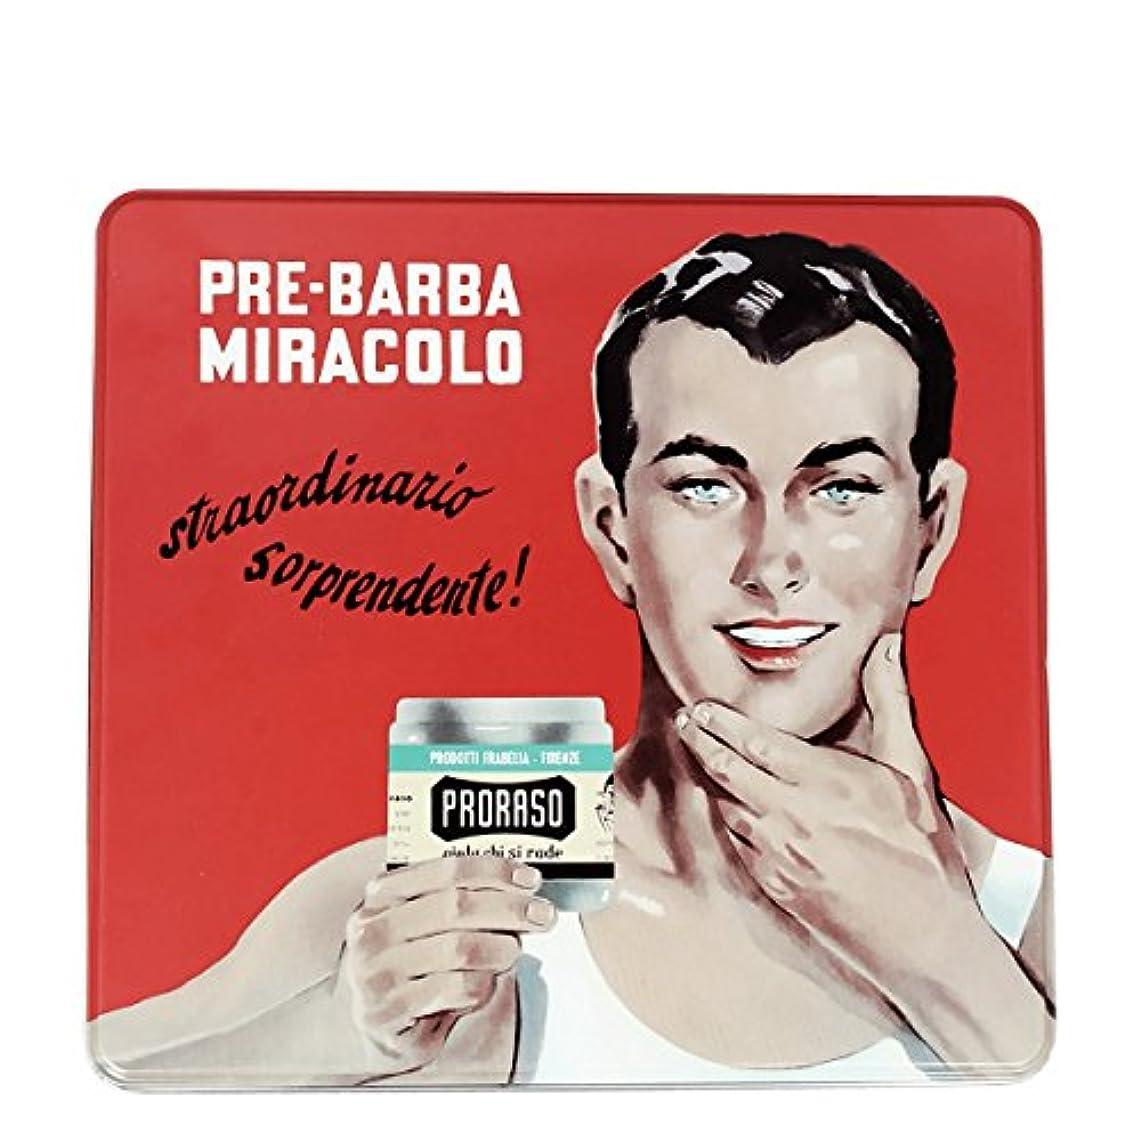 Proraso ジーノ ヴィンテージ リフレッシュ セレクション 缶[海外直送品] [並行輸入品]